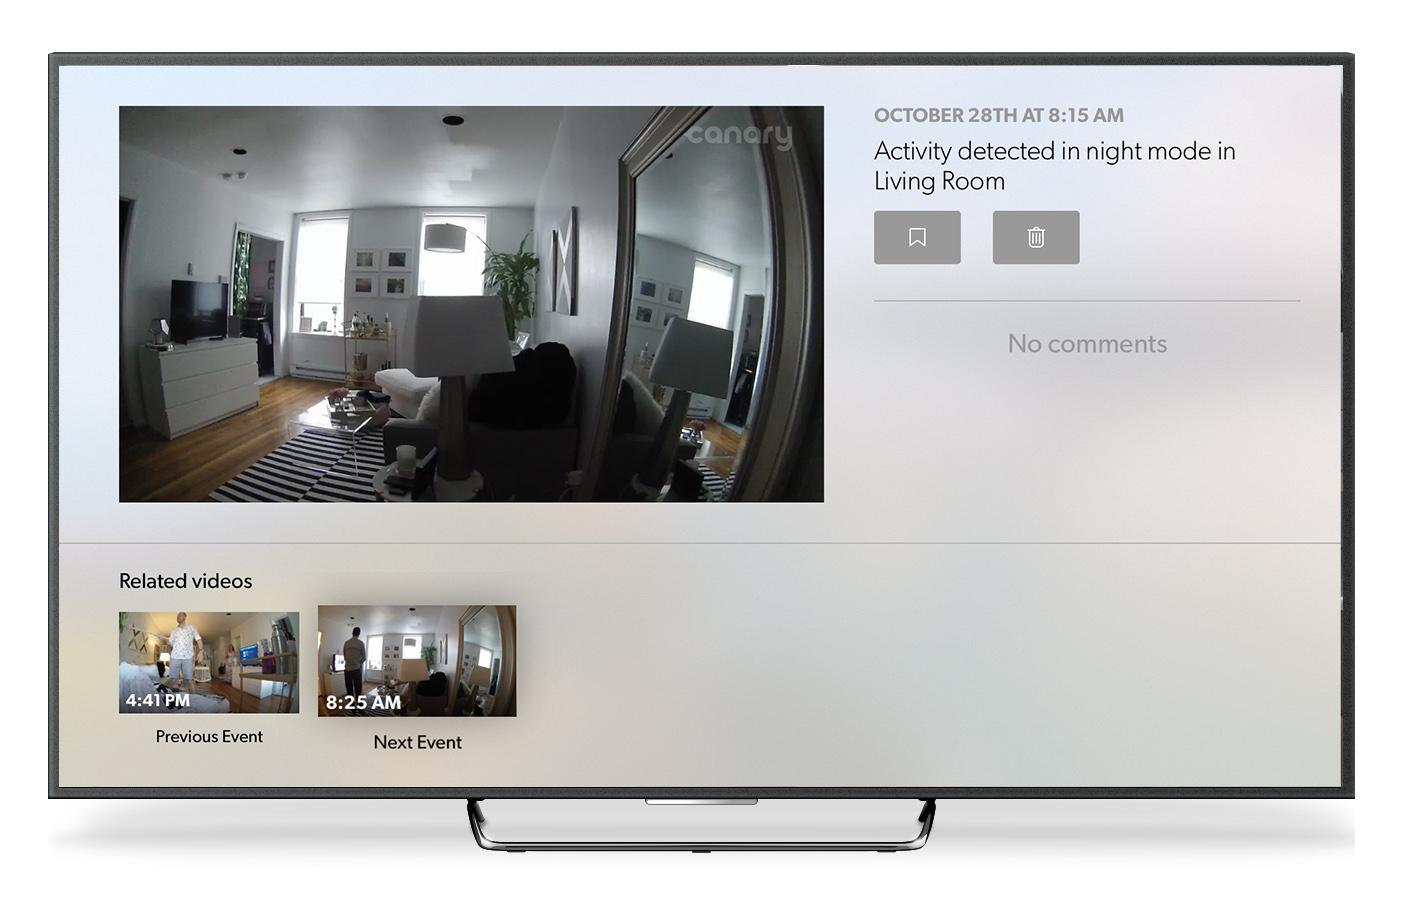 tv-image-3